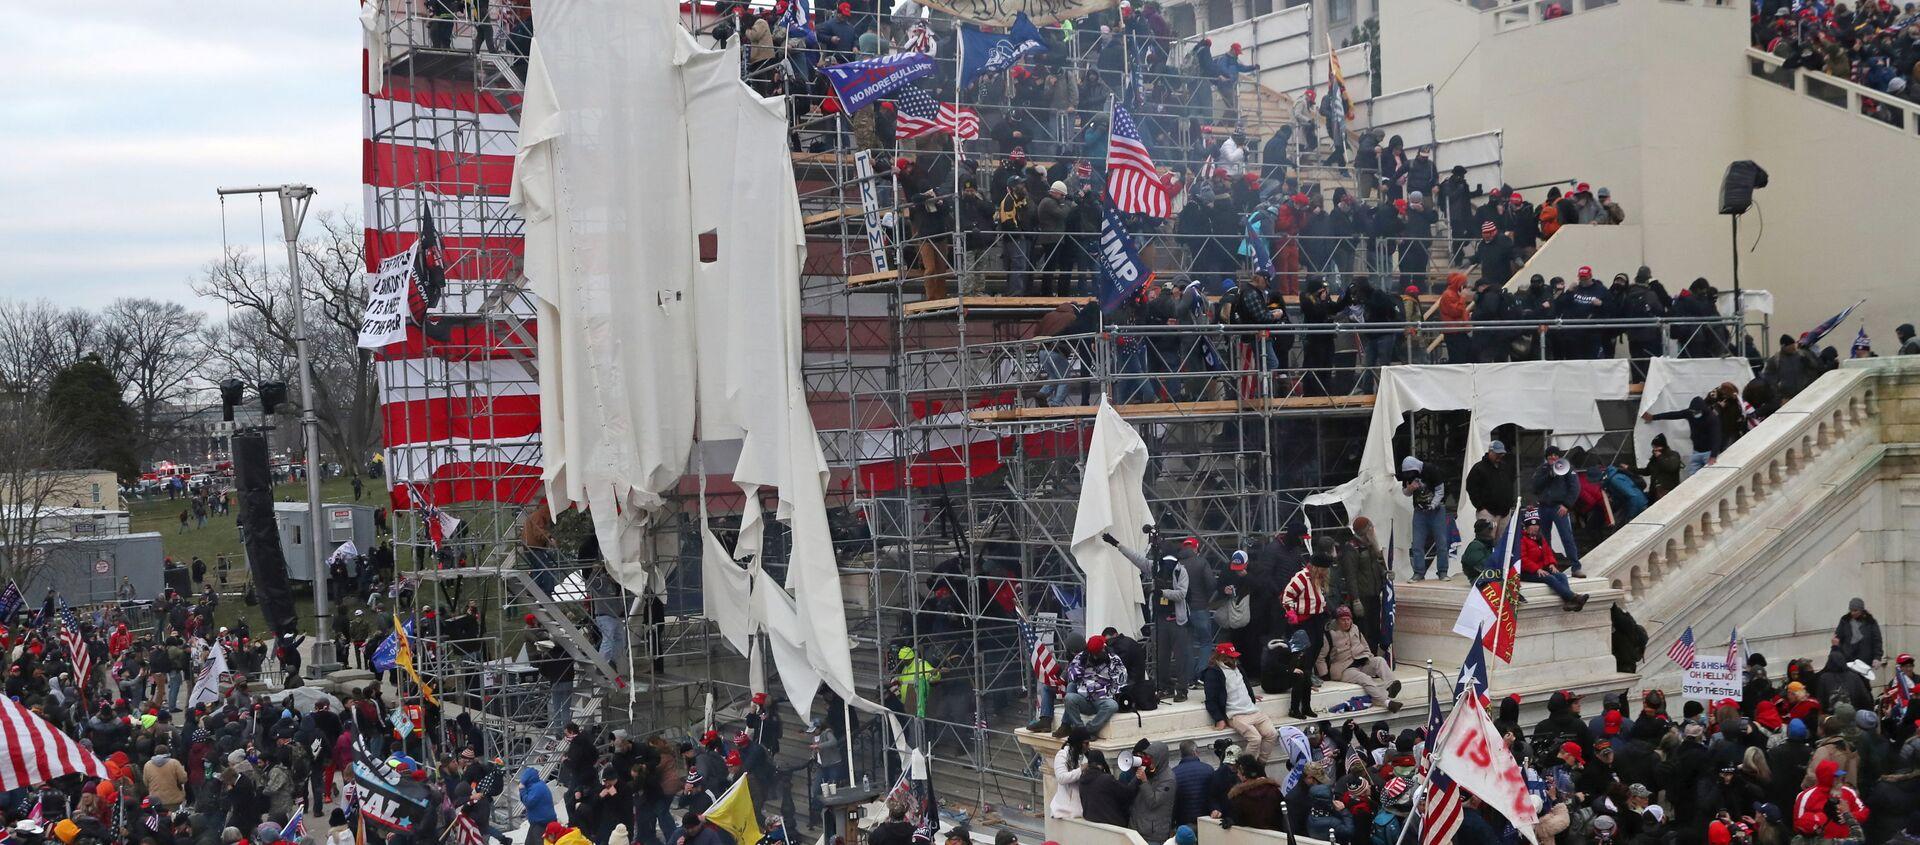 A mob of supporters of U.S. President Donald Trump storm the U.S. Capitol Building in Washington, U.S., January 6, 2021. Picture taken January 6, 2021. - Sputnik Italia, 1920, 13.01.2021